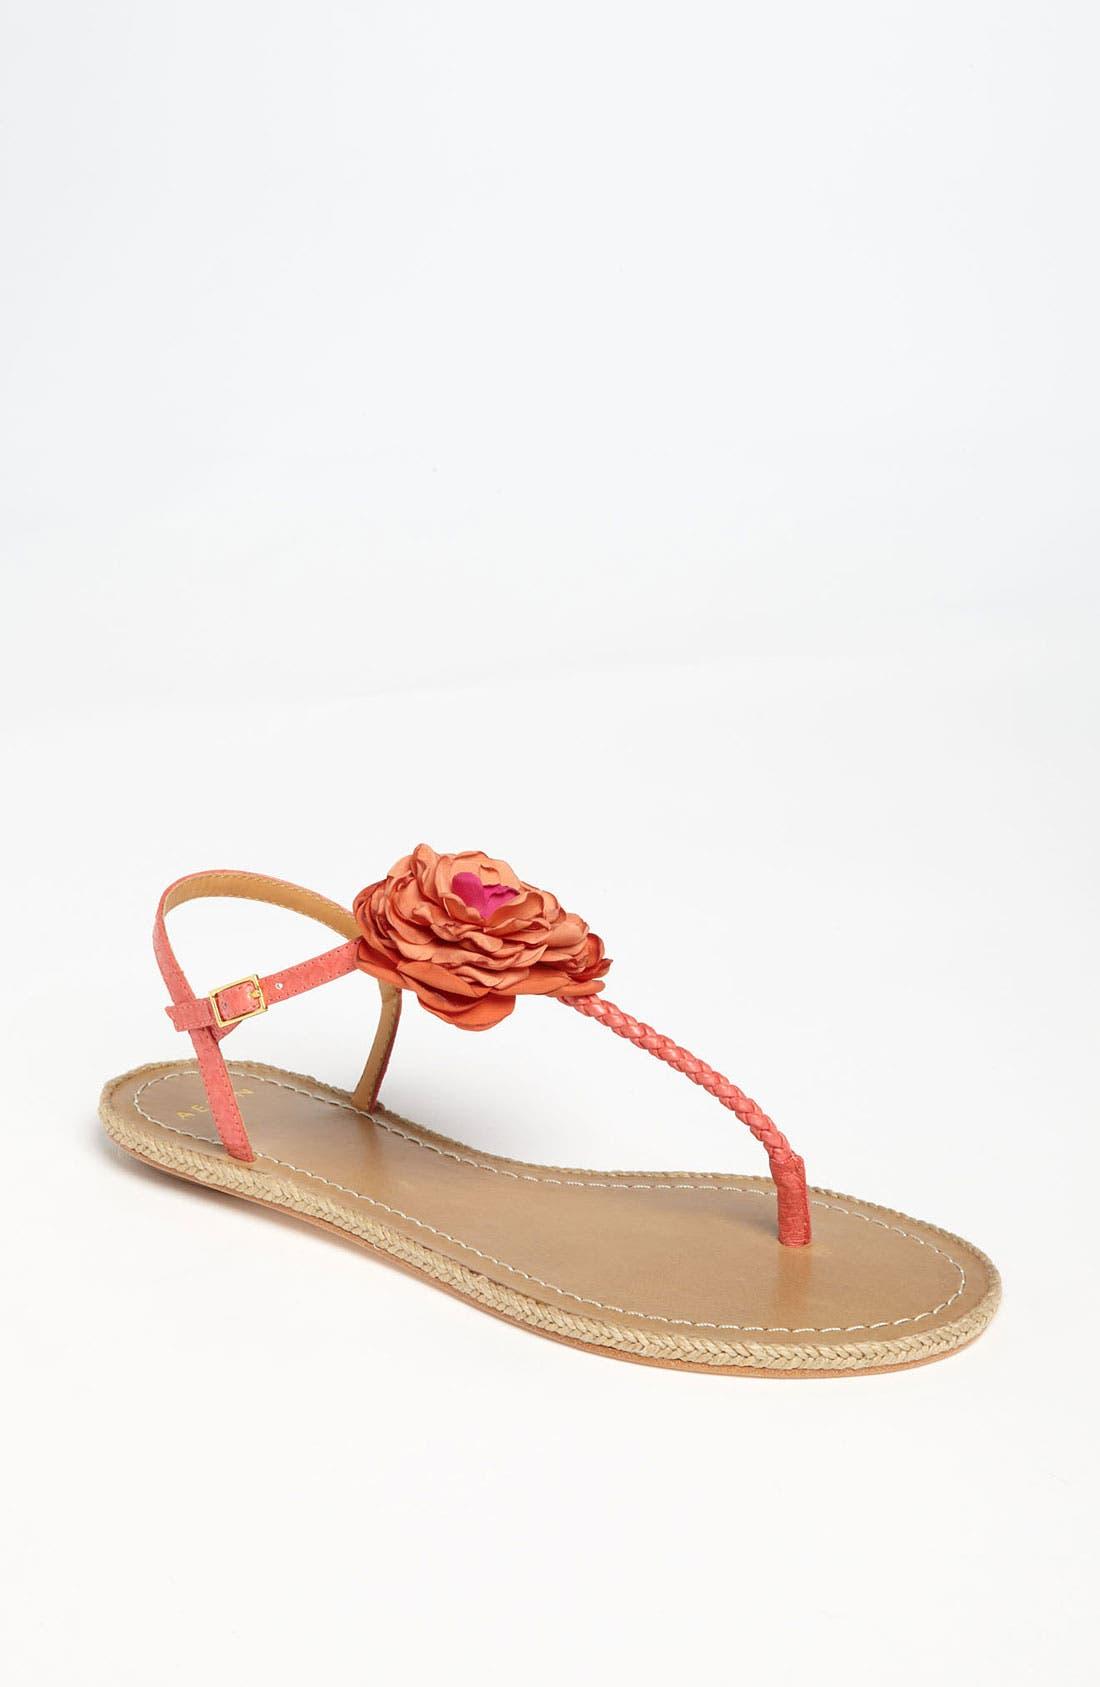 Alternate Image 1 Selected - Aerin 'Pedros' Sandal